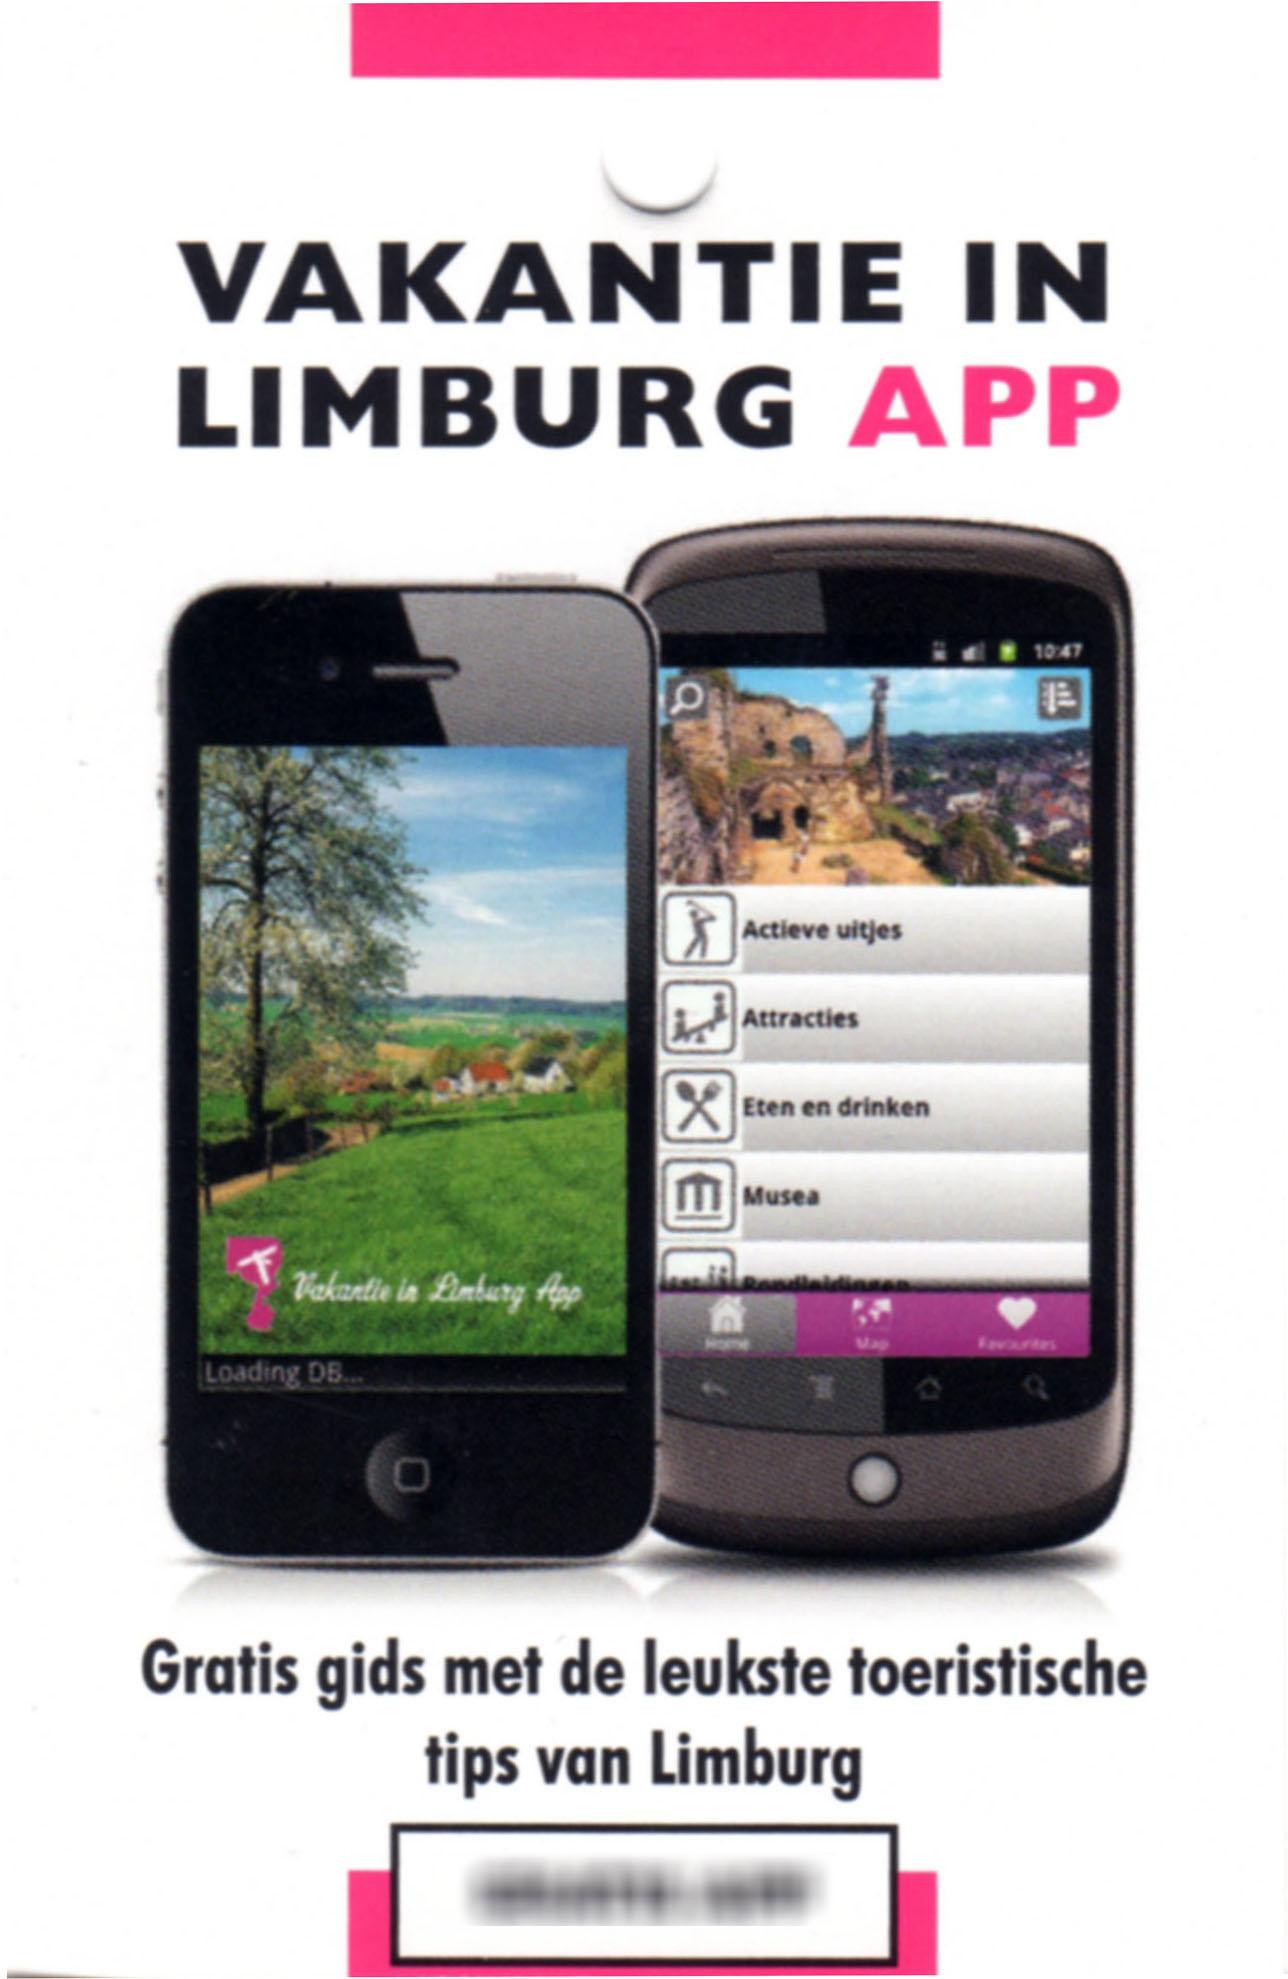 Limburg app